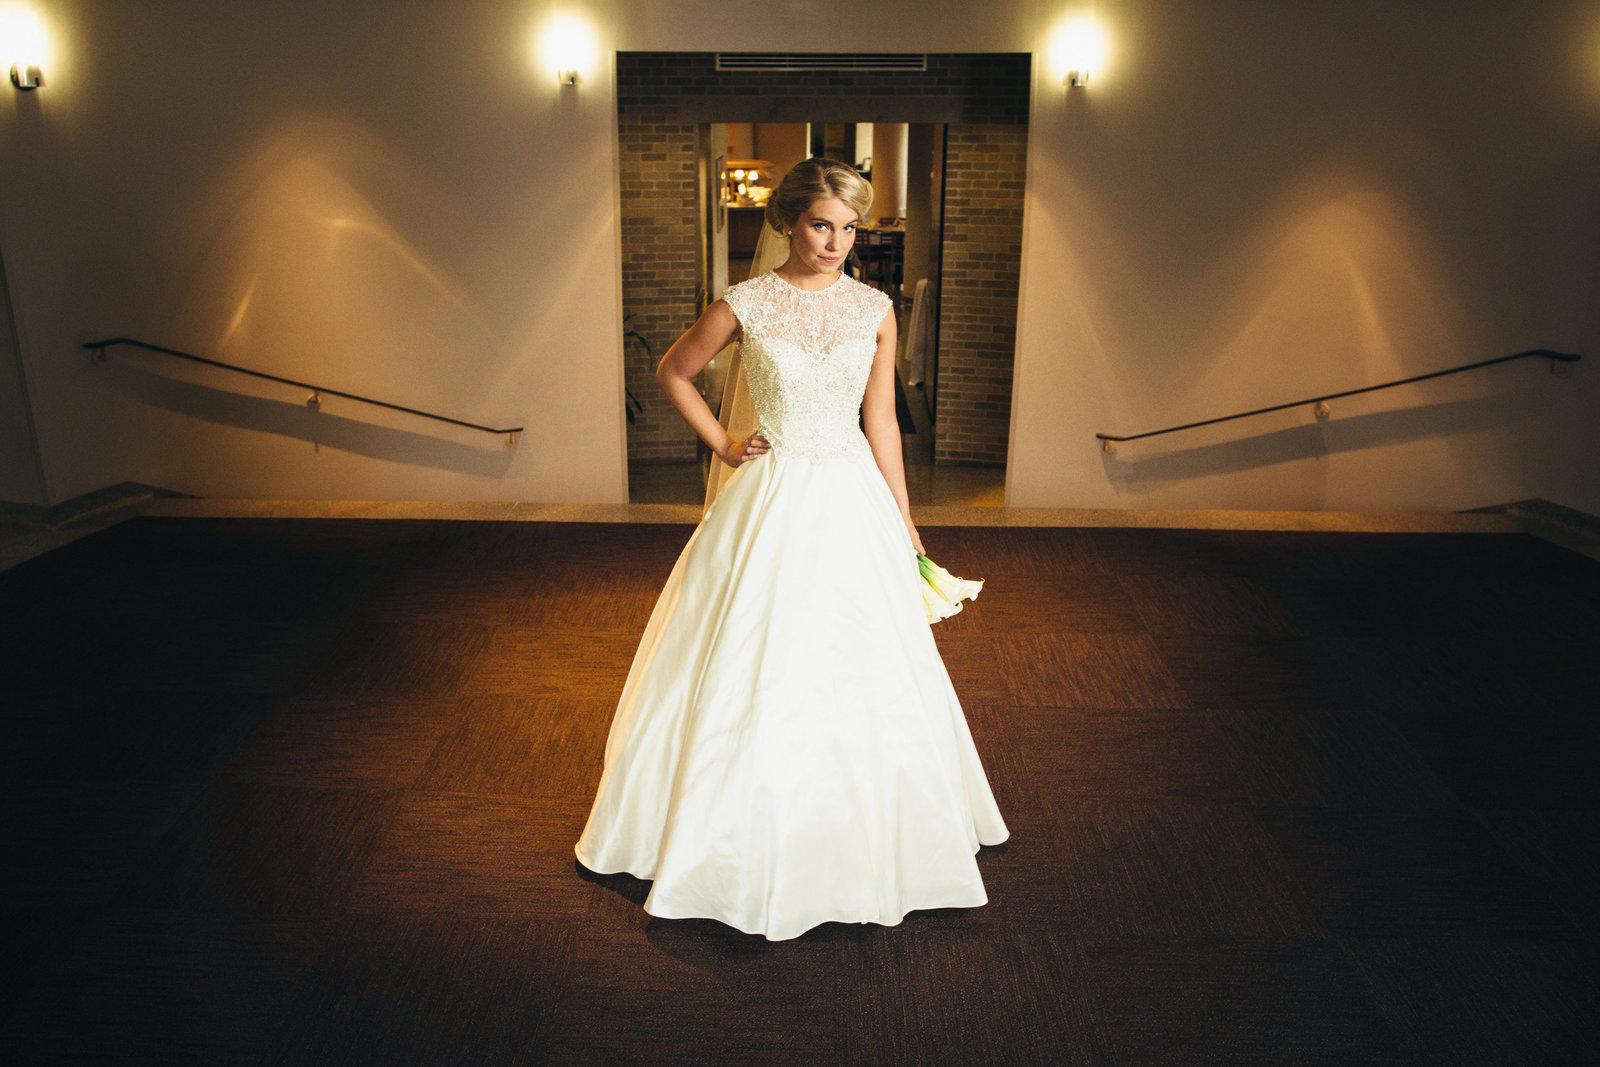 Wedding Shoppe Brian Bossany 2015 Brides-Grace Zach-0023